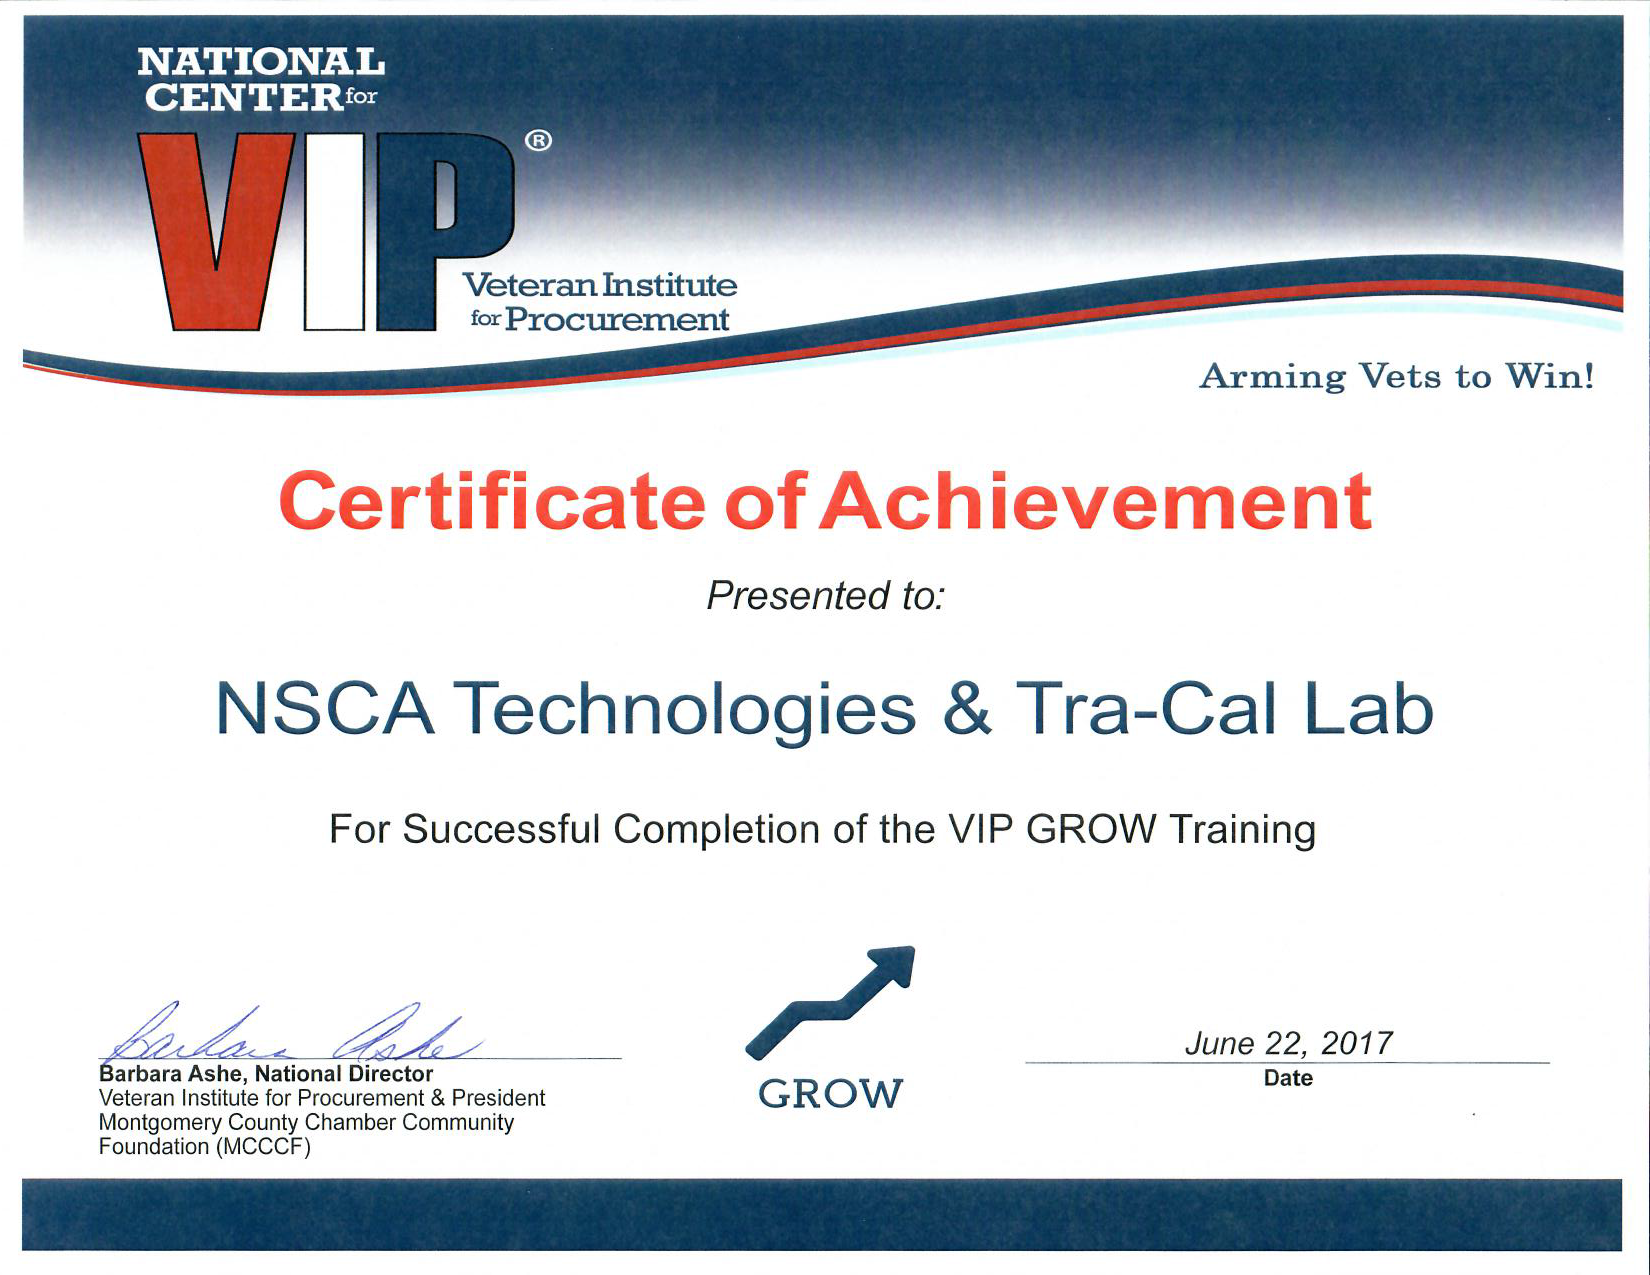 NSCA-Tra-Cal_VIP_Grow_certificate